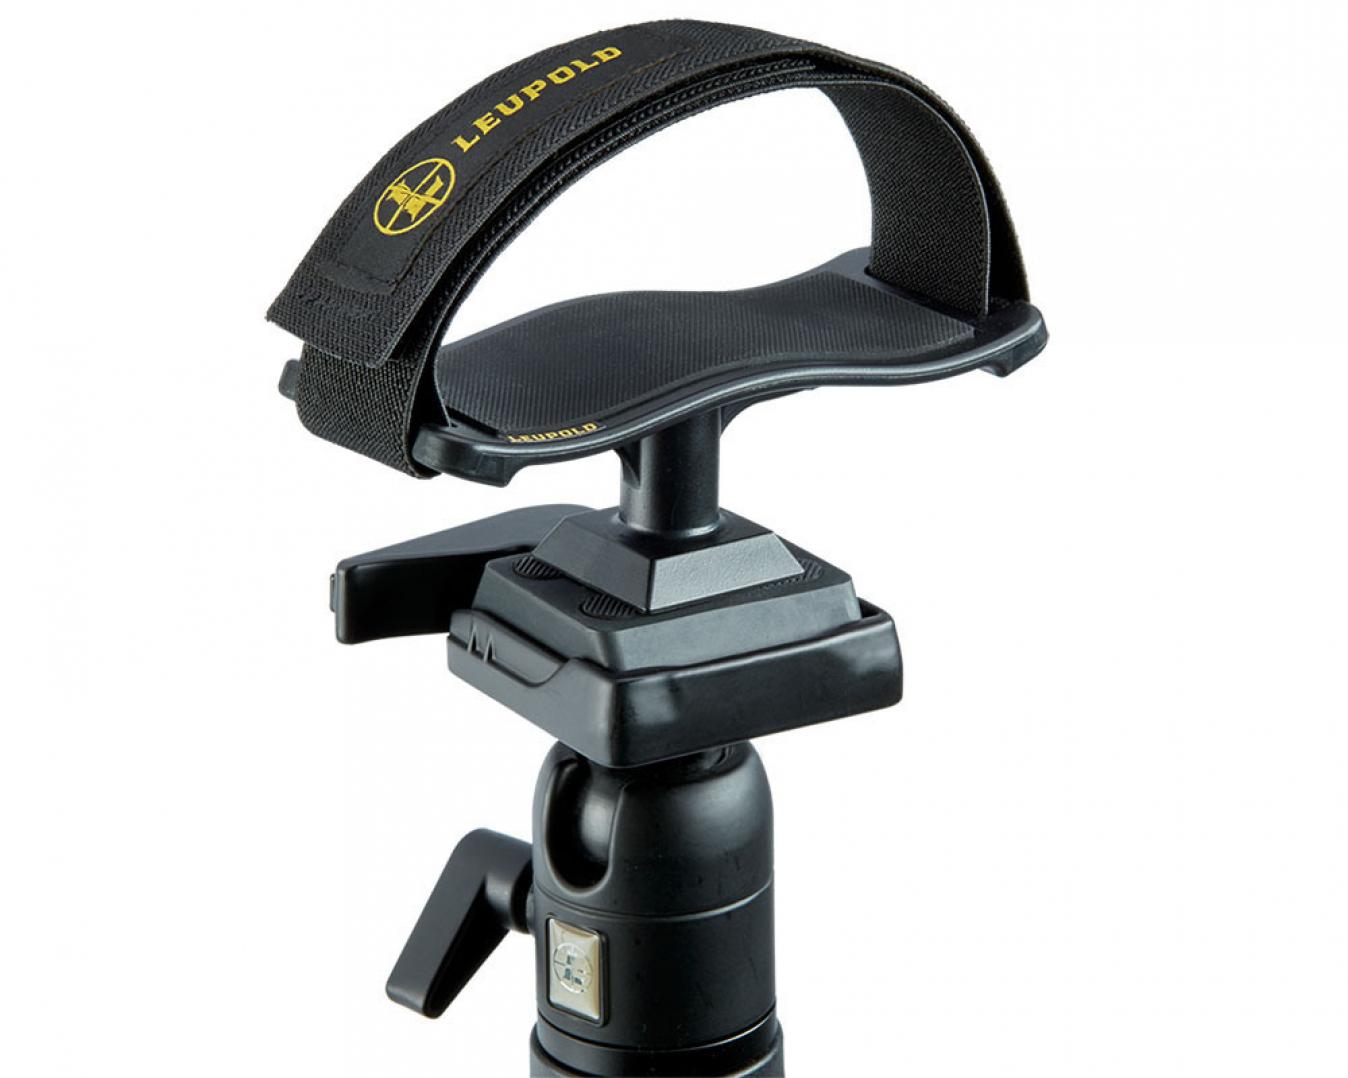 Leupold Binocular Tripod Adapter Tray Pro Gear